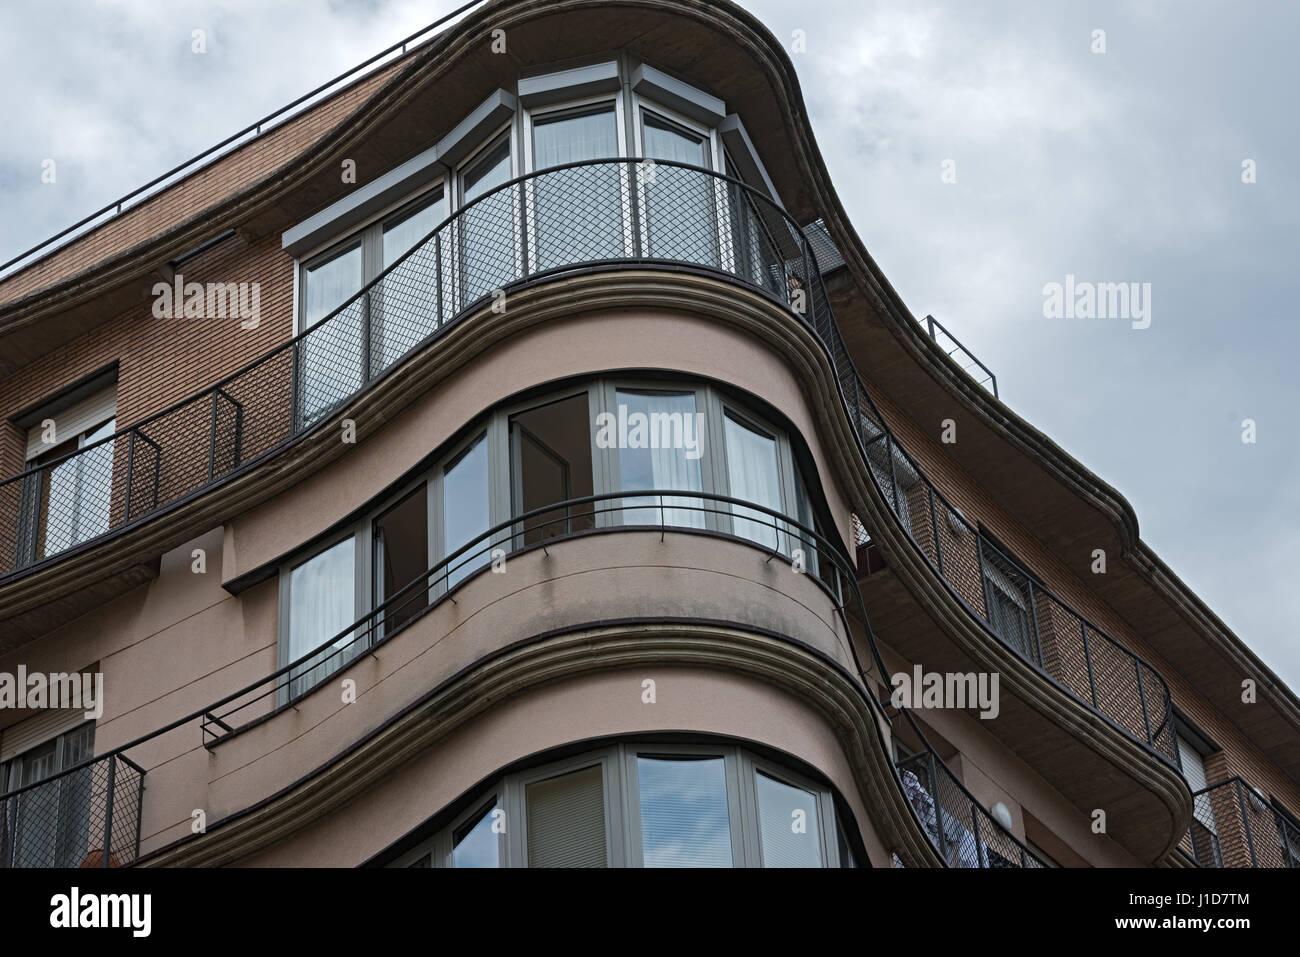 Closeup Corner Bay Window And Balcony Detailes Of Building In Barcelona,  Spain